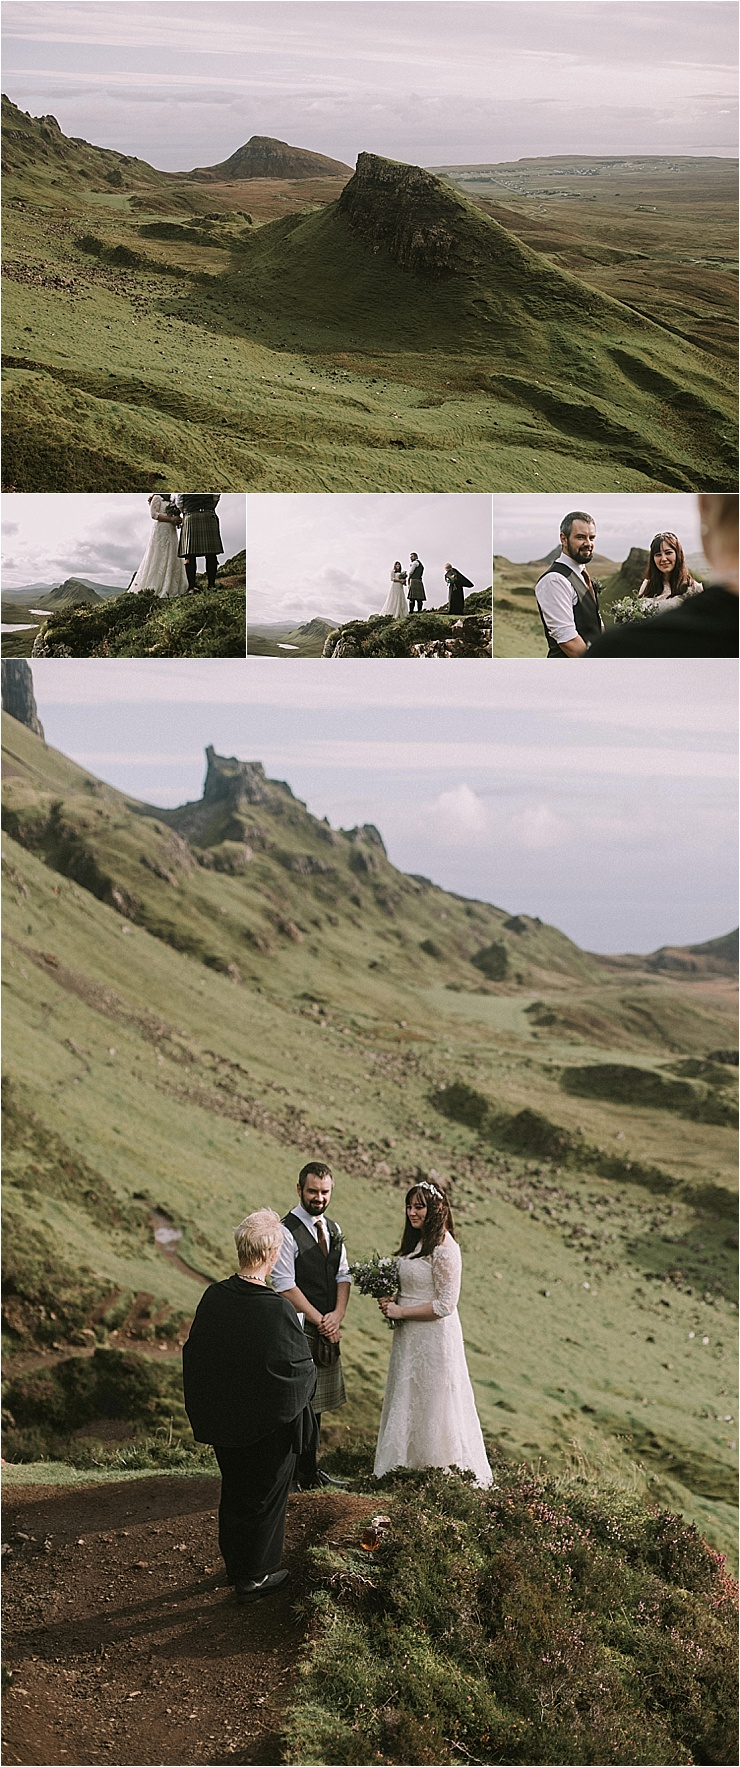 Hillside elopement ceremony on the Isle of Skye by Maureen Du Preez